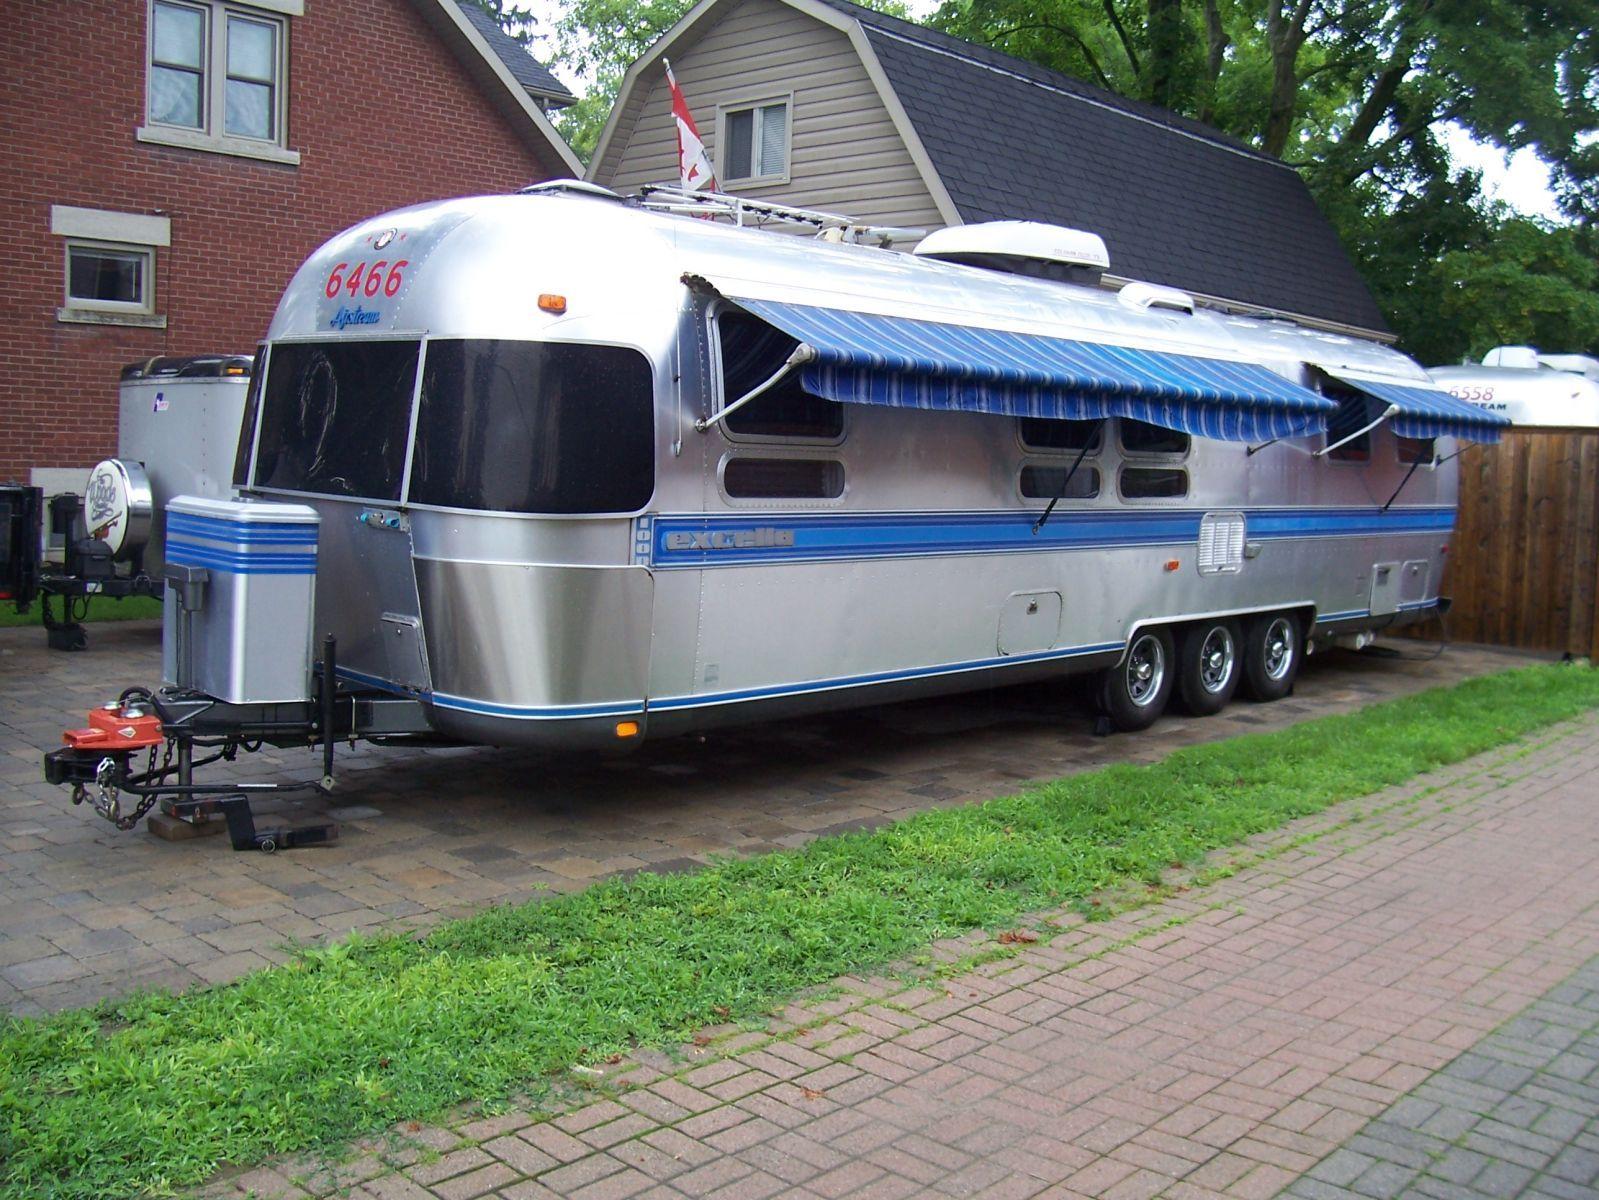 Airstreams 4 Sale Airstream Nz Vintage Airstream